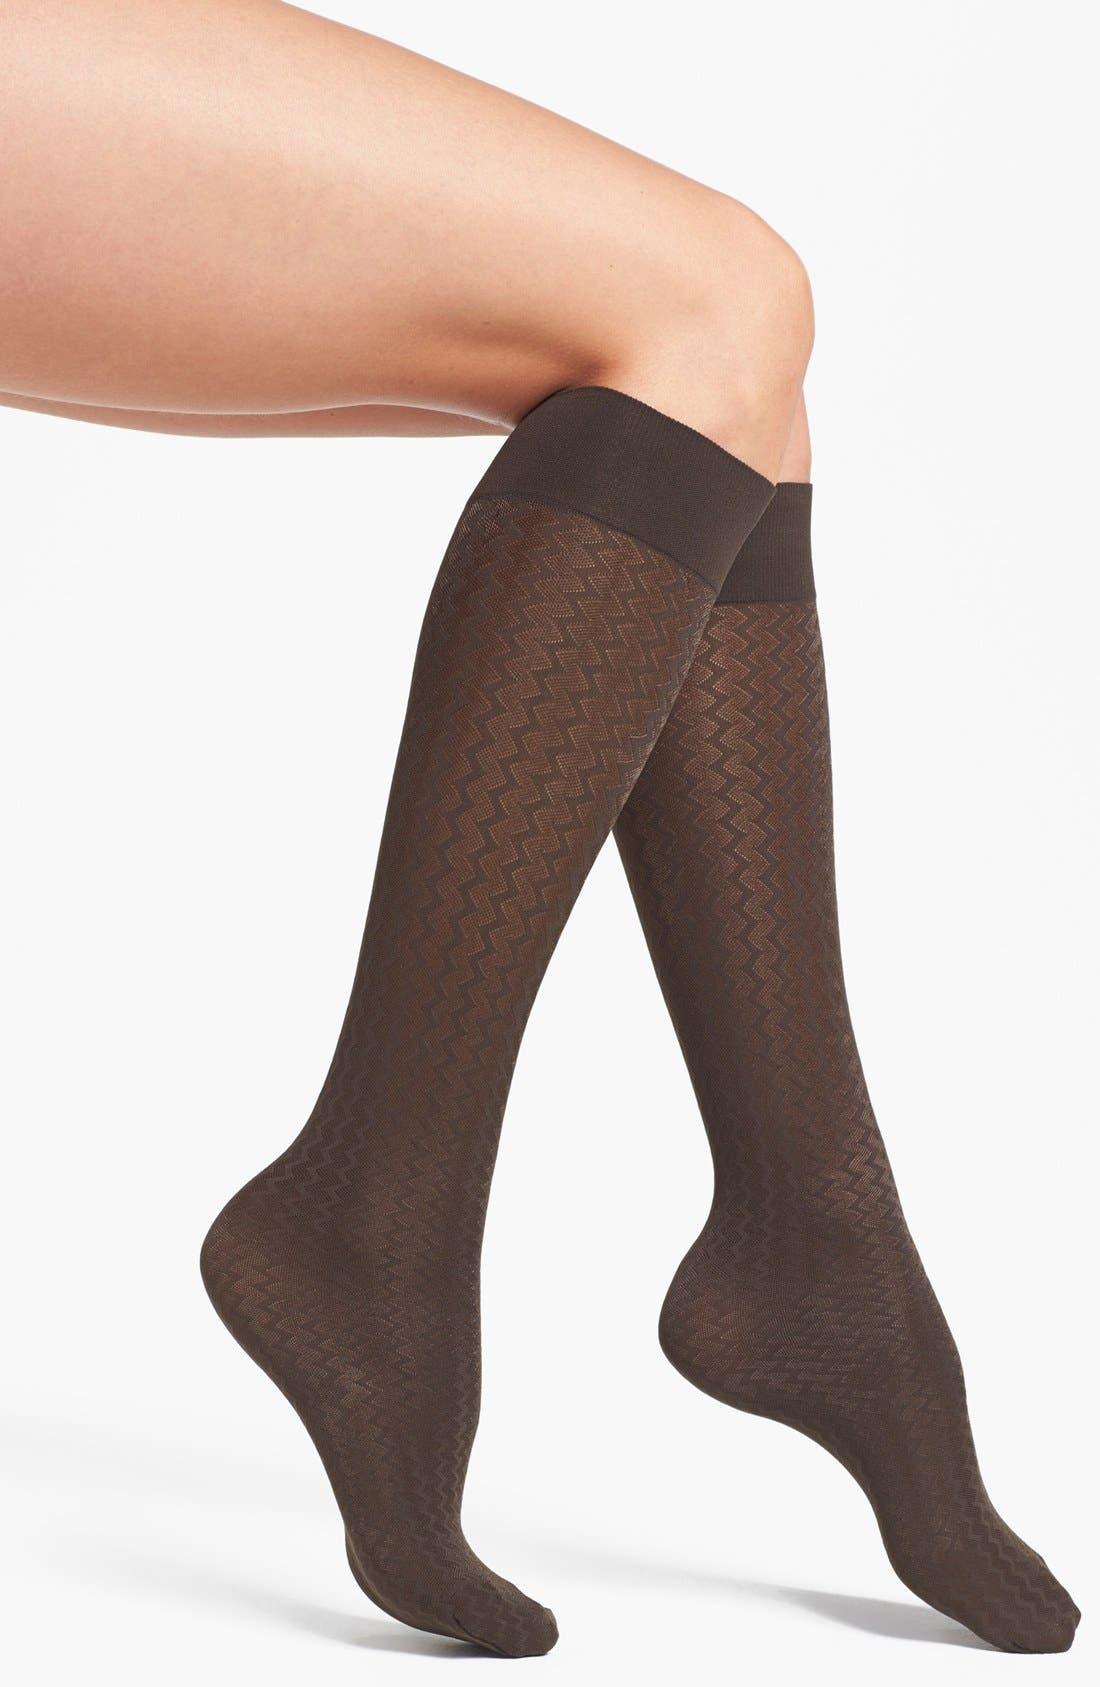 Main Image - Wolford 'Cross Lines' Knee High Socks